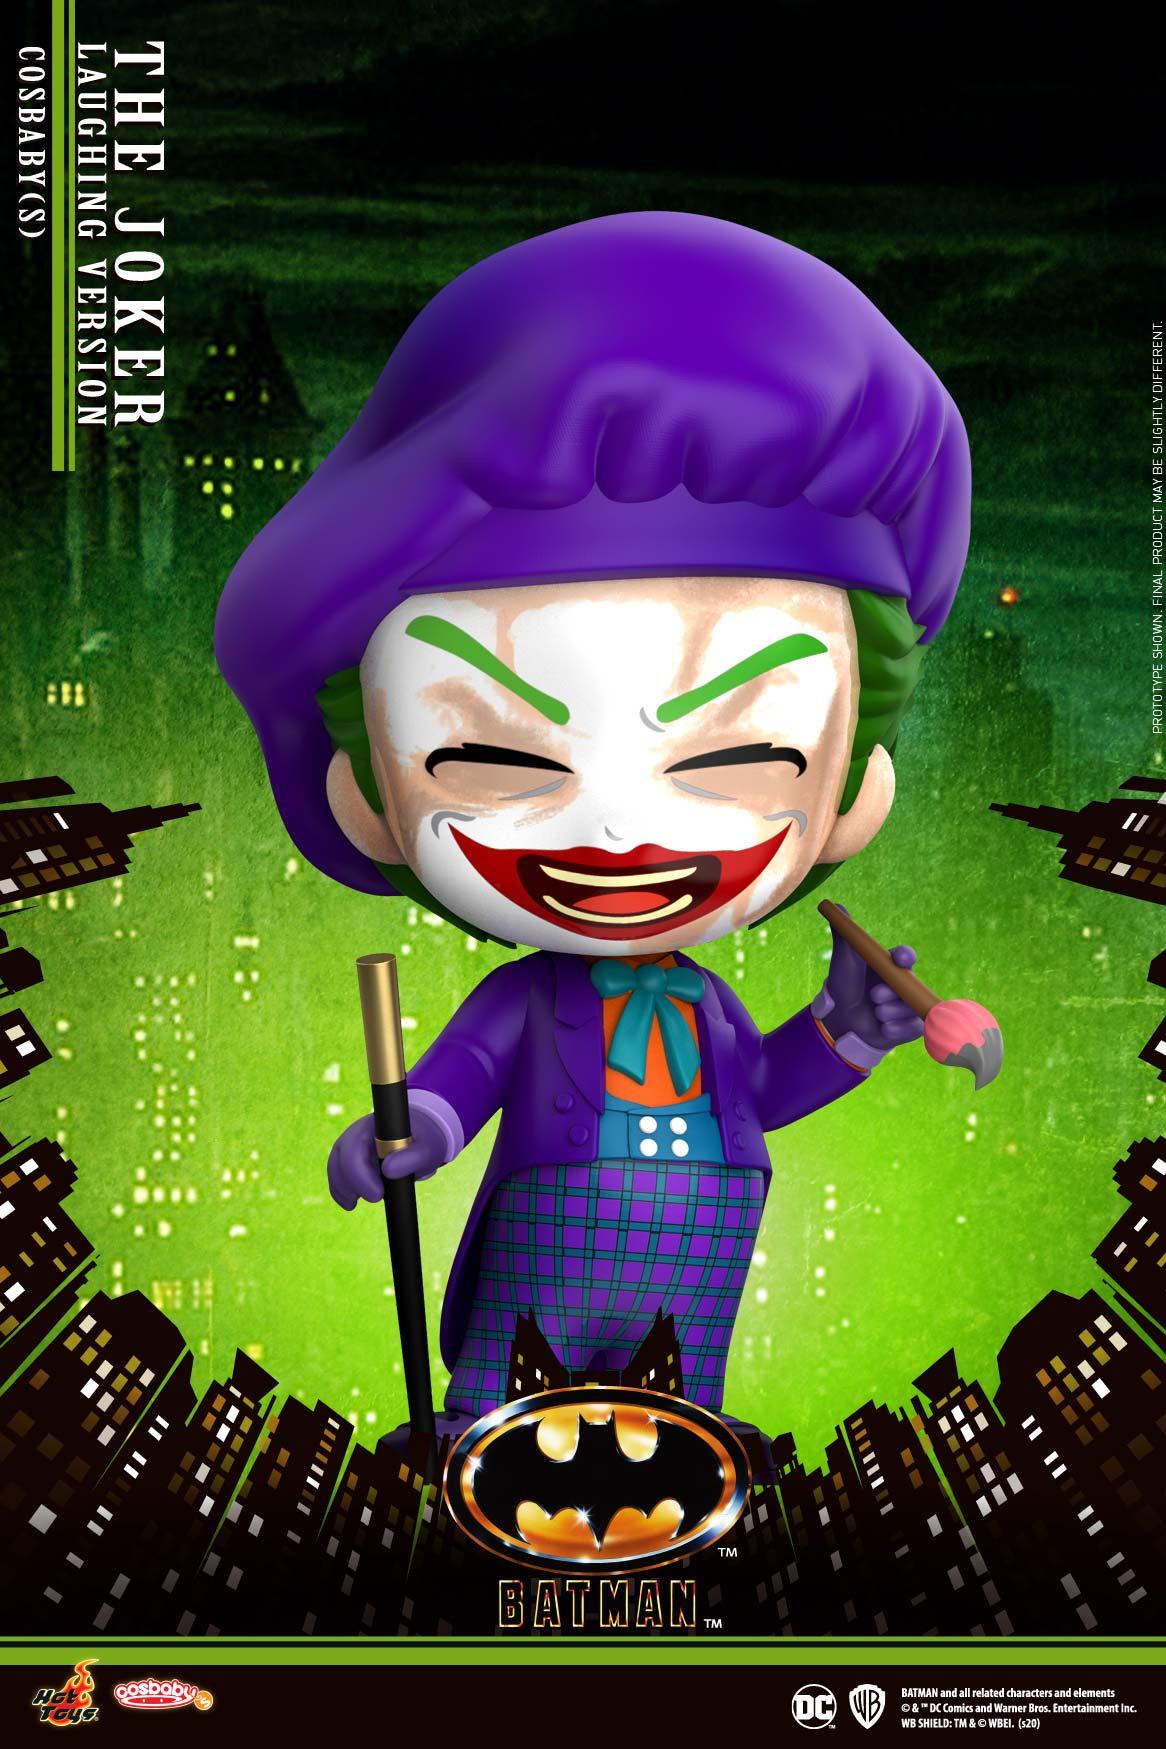 Batman-1989_COSB712_The-Joker-(Laughing)_V01